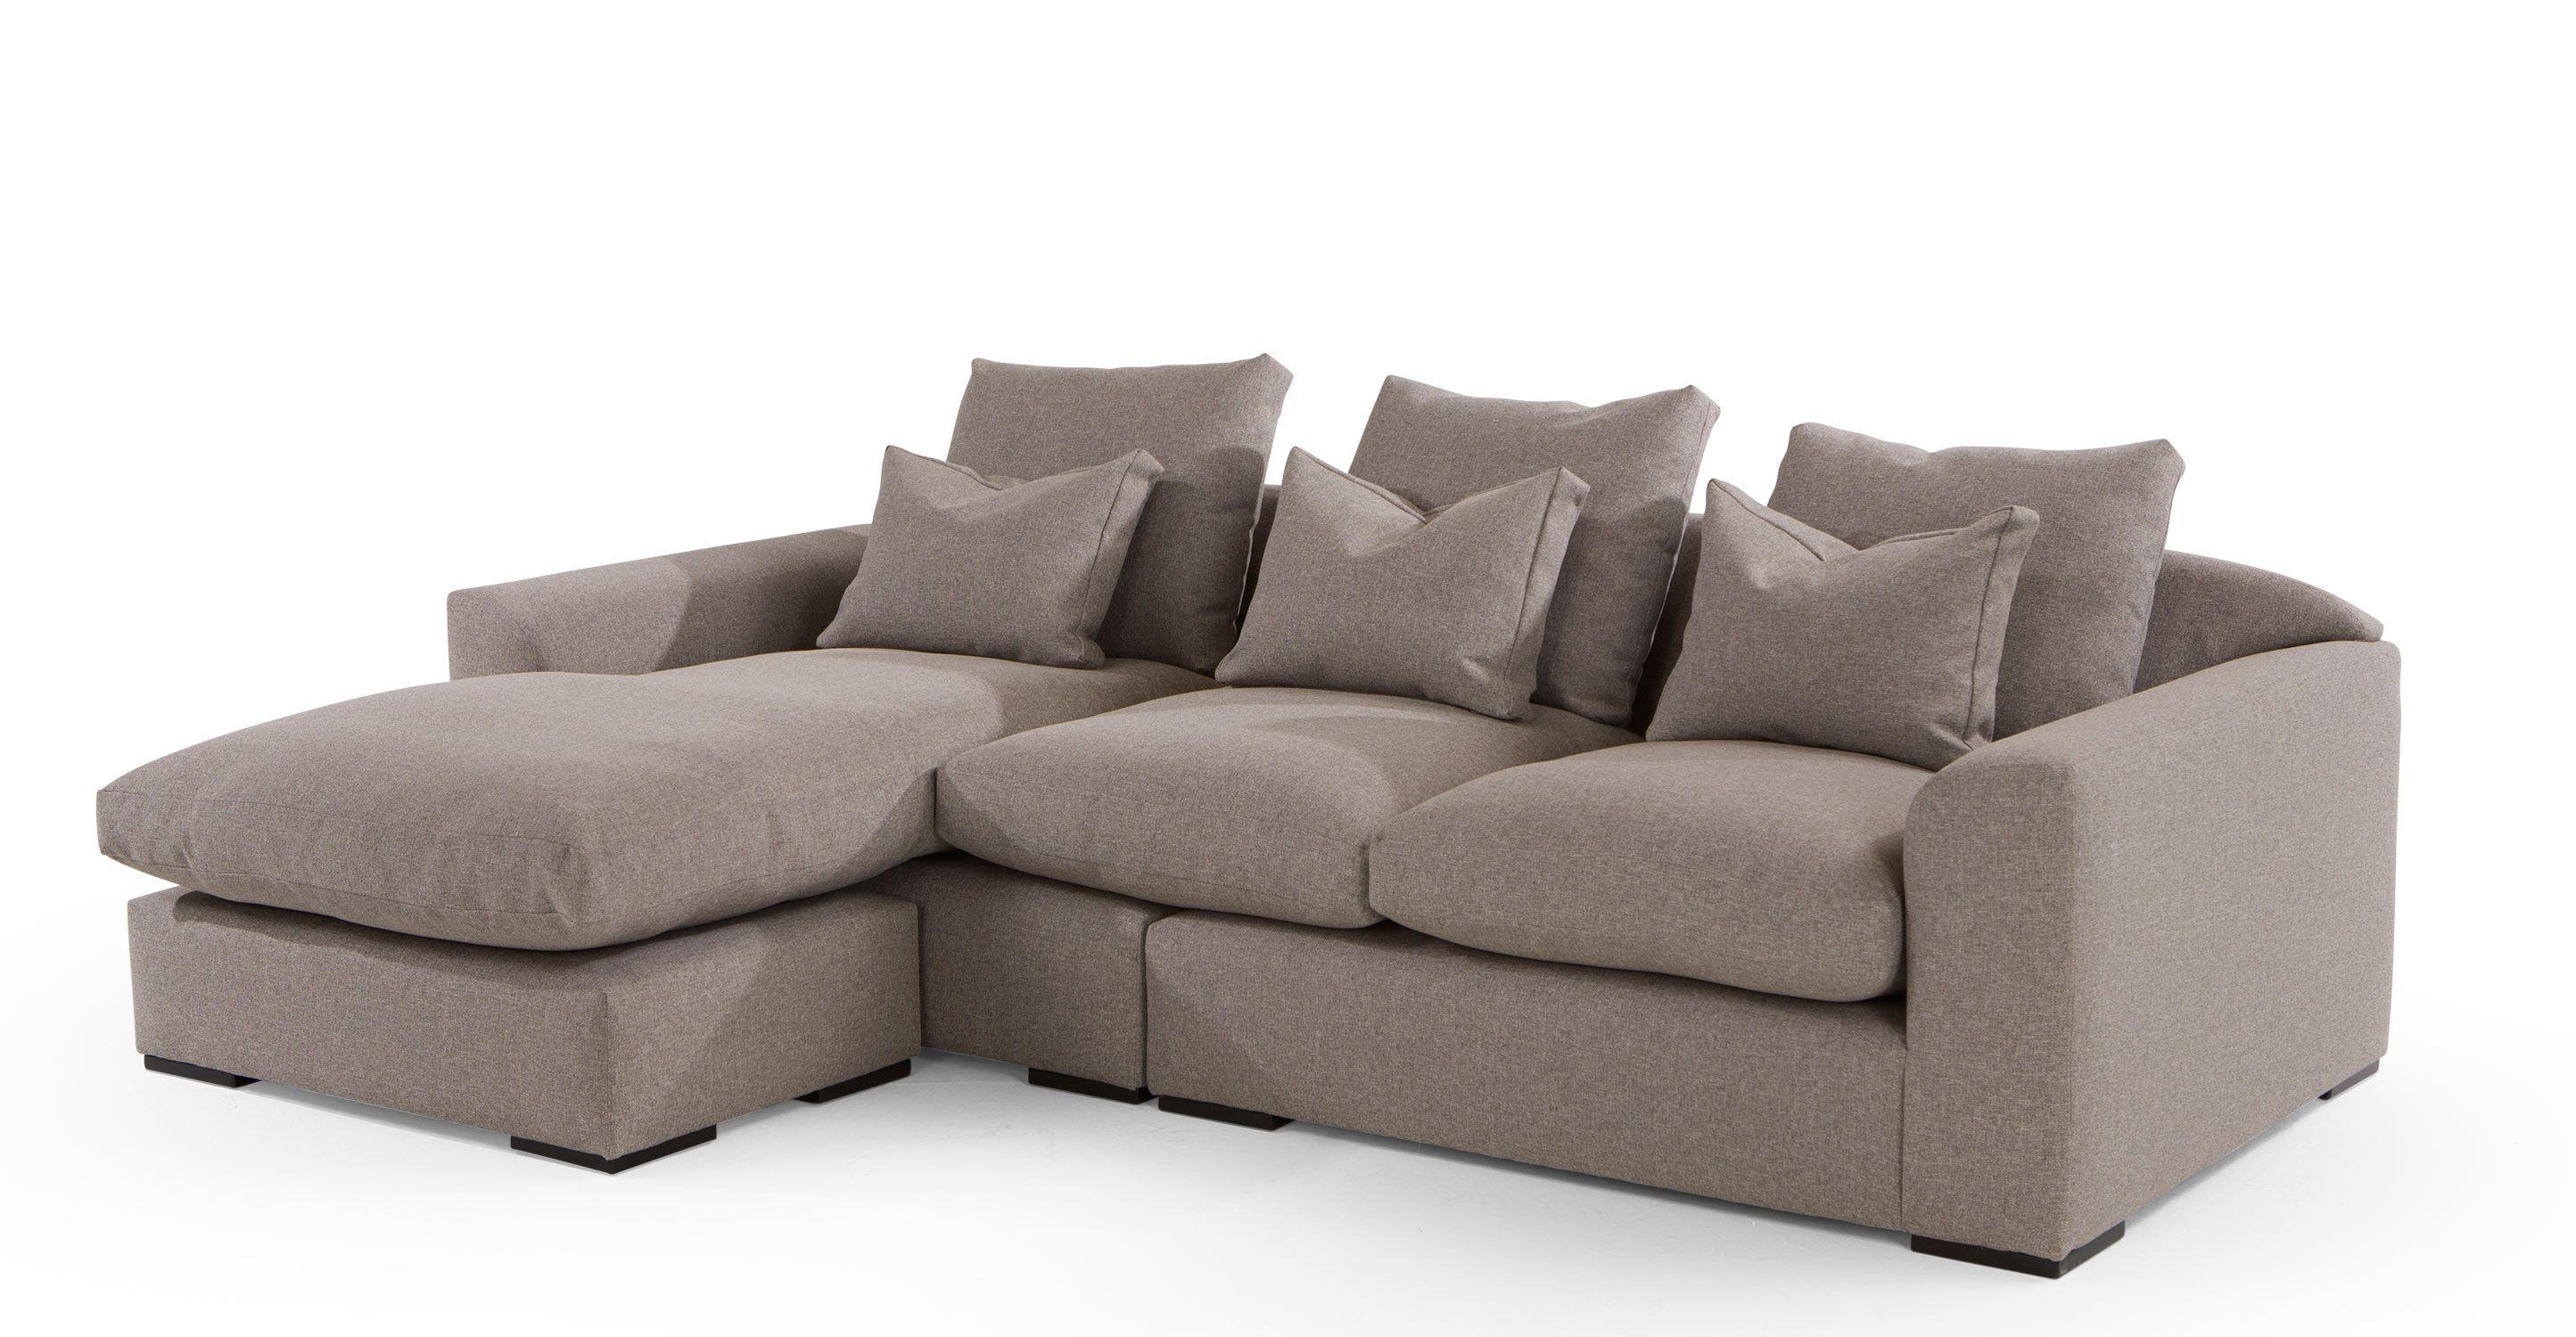 Christian Large Corner Sofa Fawn Weave 1 099 Sofa Sofa Design Sofa Online